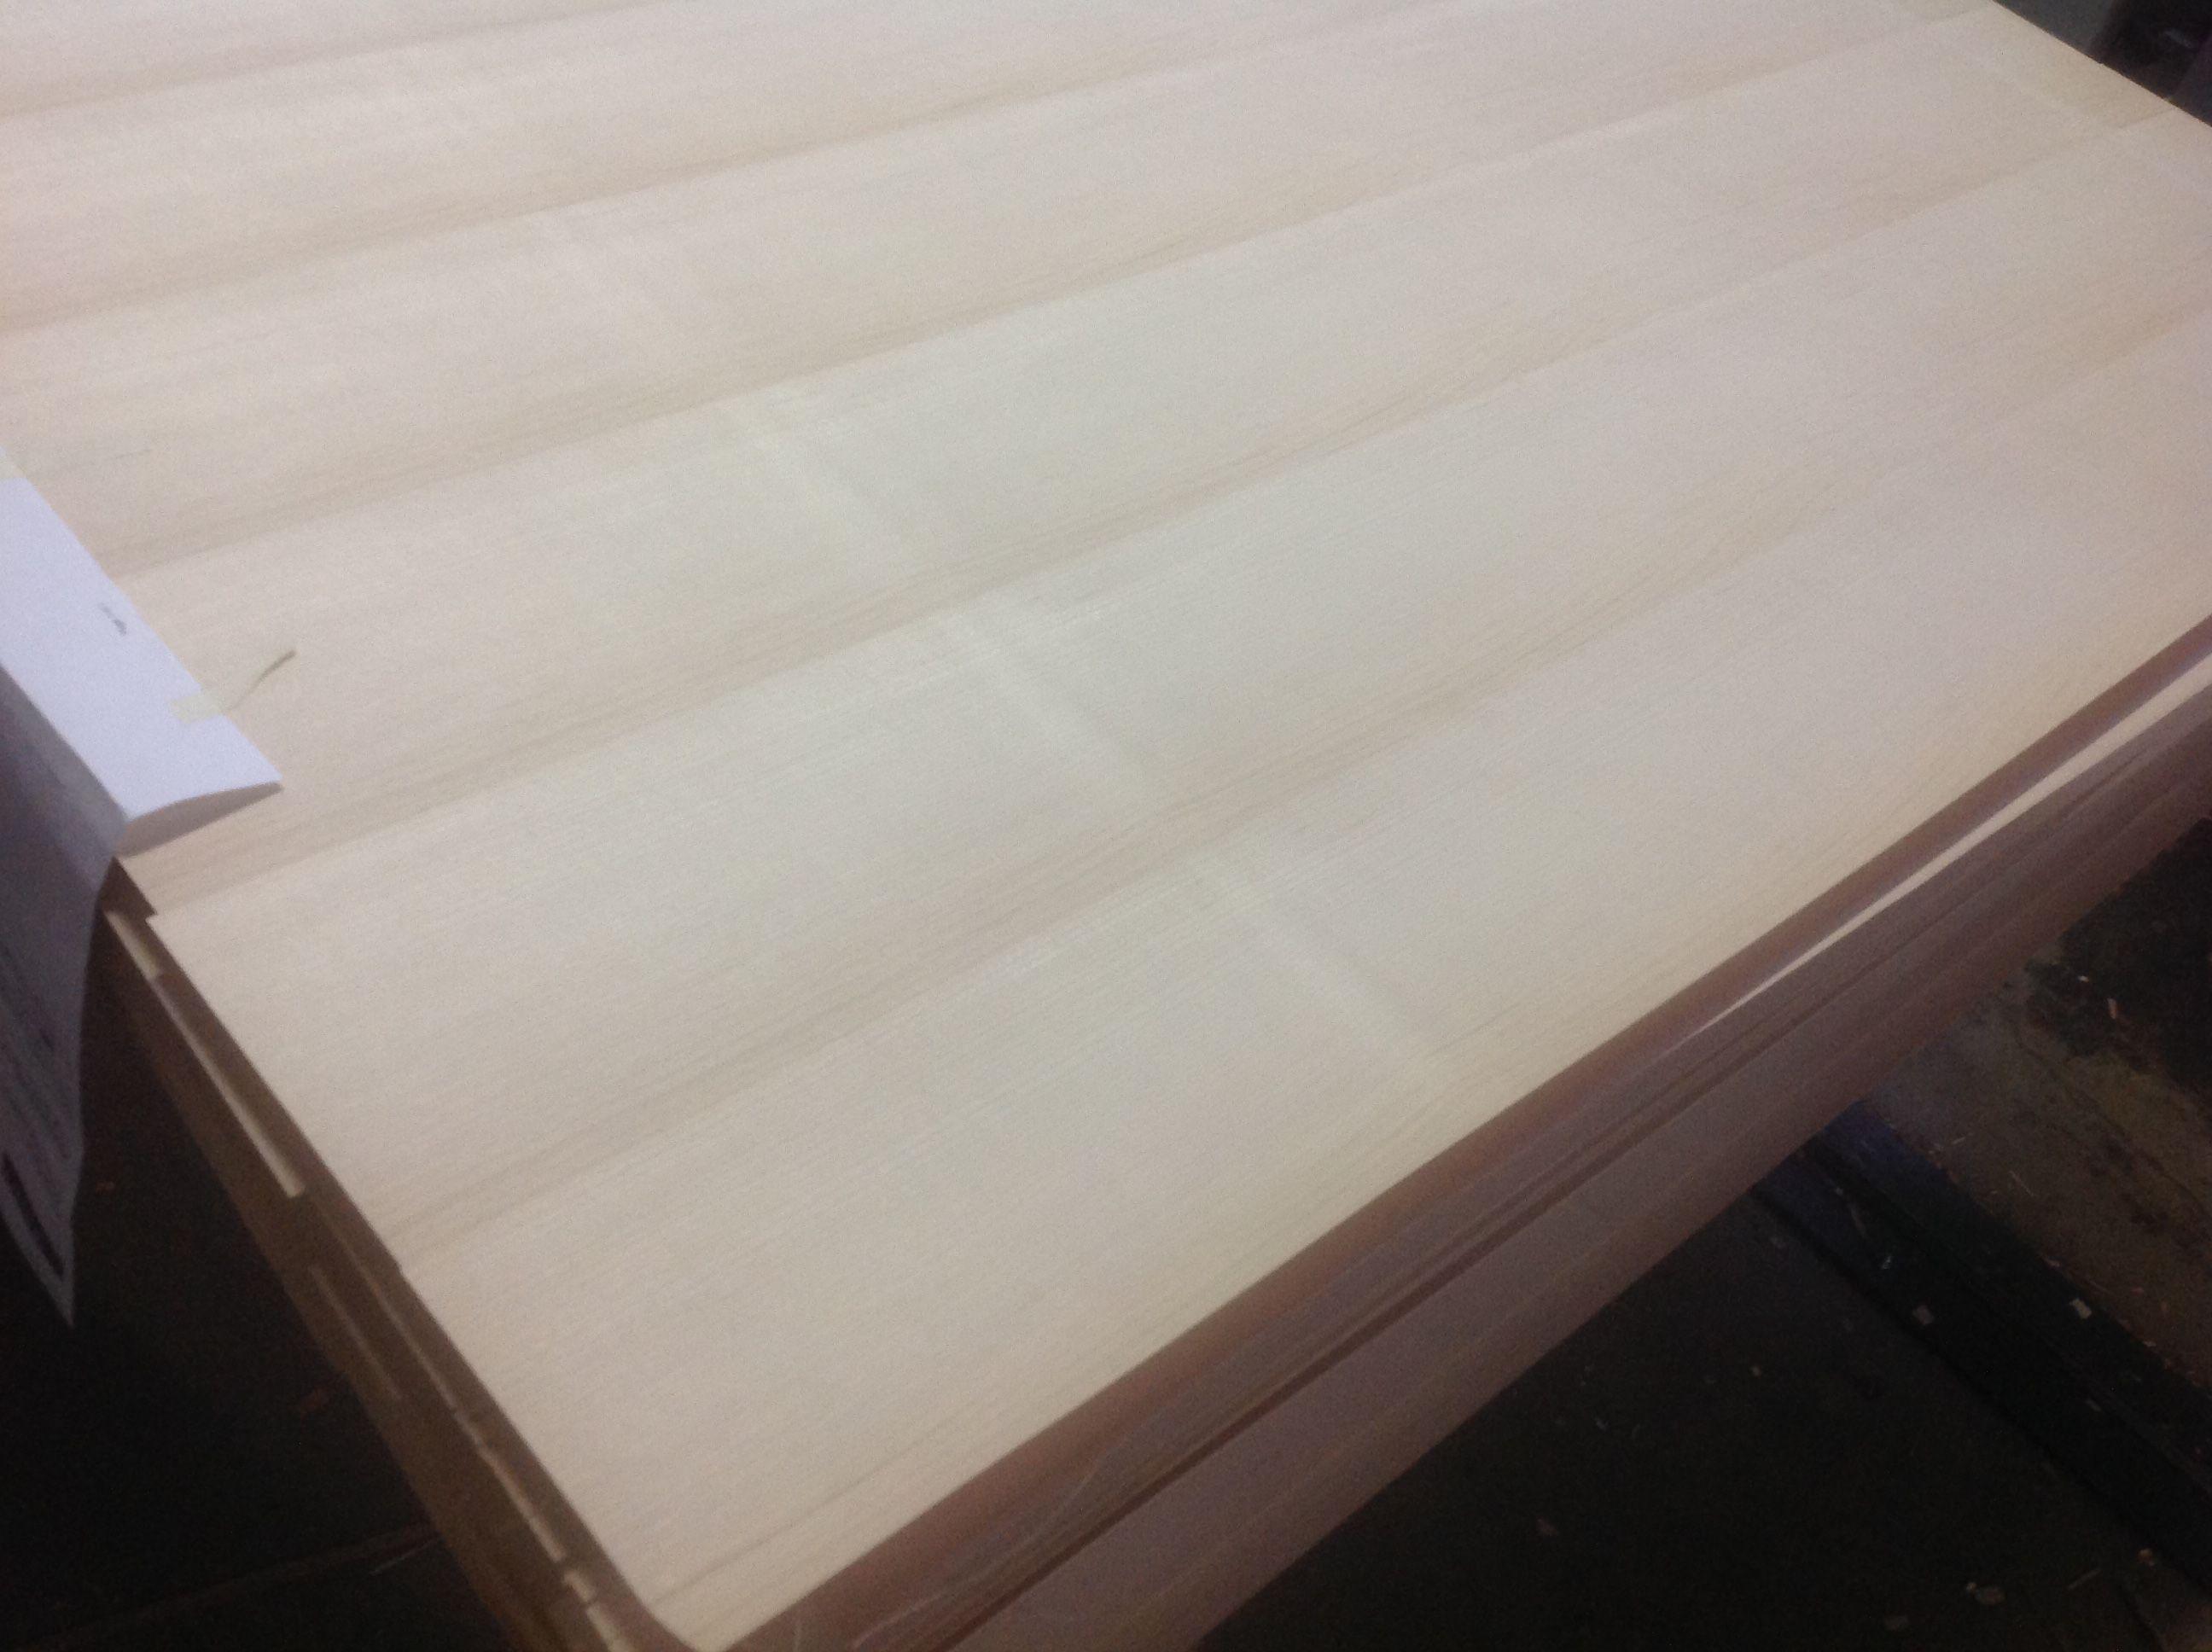 Thewarmnaturalambienceofarchitecturalplywoodmanufactureddistributedatt 9056696800 Design Interiordesign Decor Architec Wood Veneer Hardwood Plywood Veneers